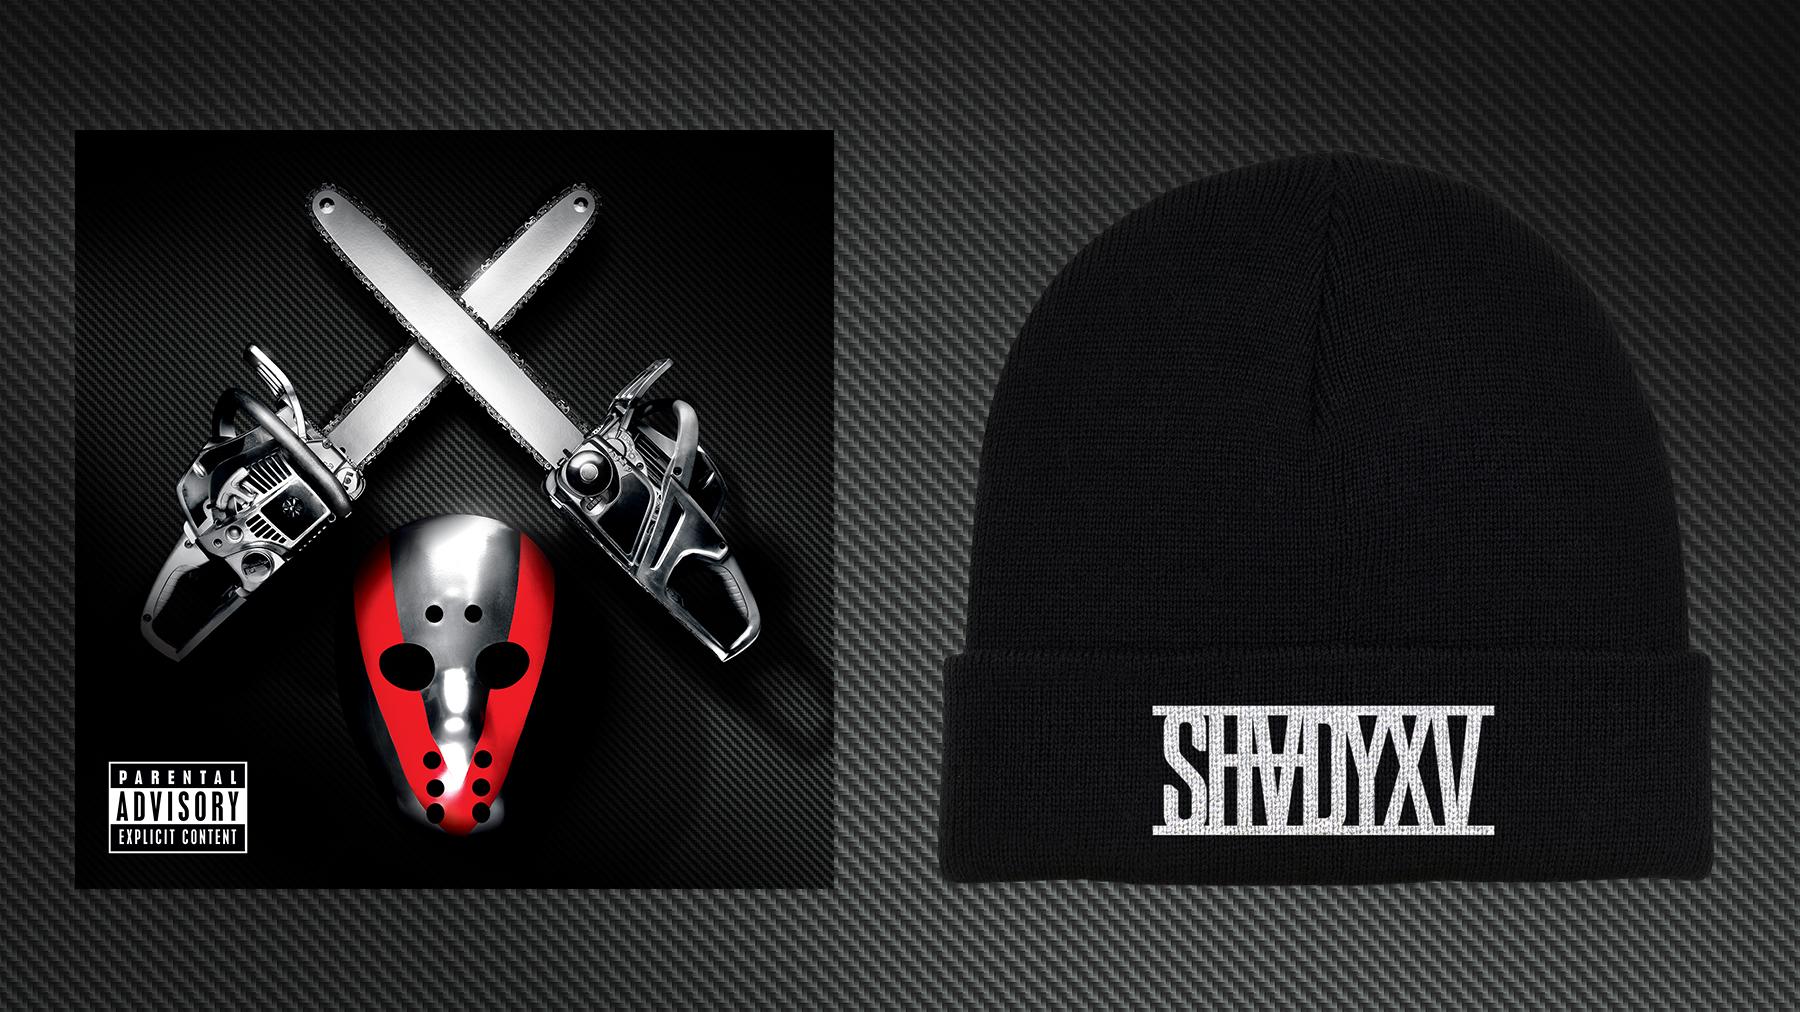 Eminem SHADYXV PRE-ORDER 2 DISC CD AND BEANIE